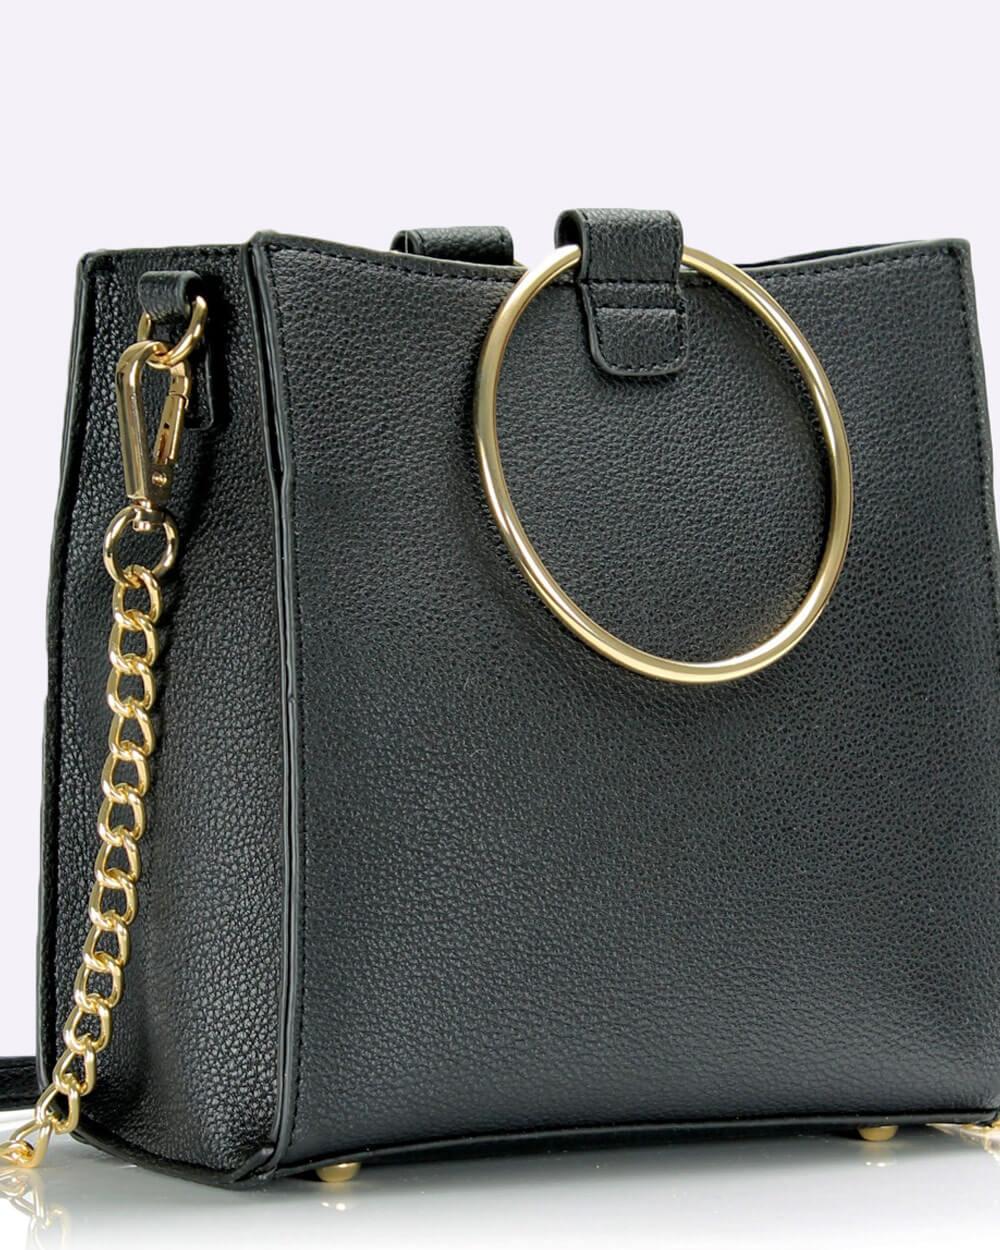 Scarleton vegan handbags